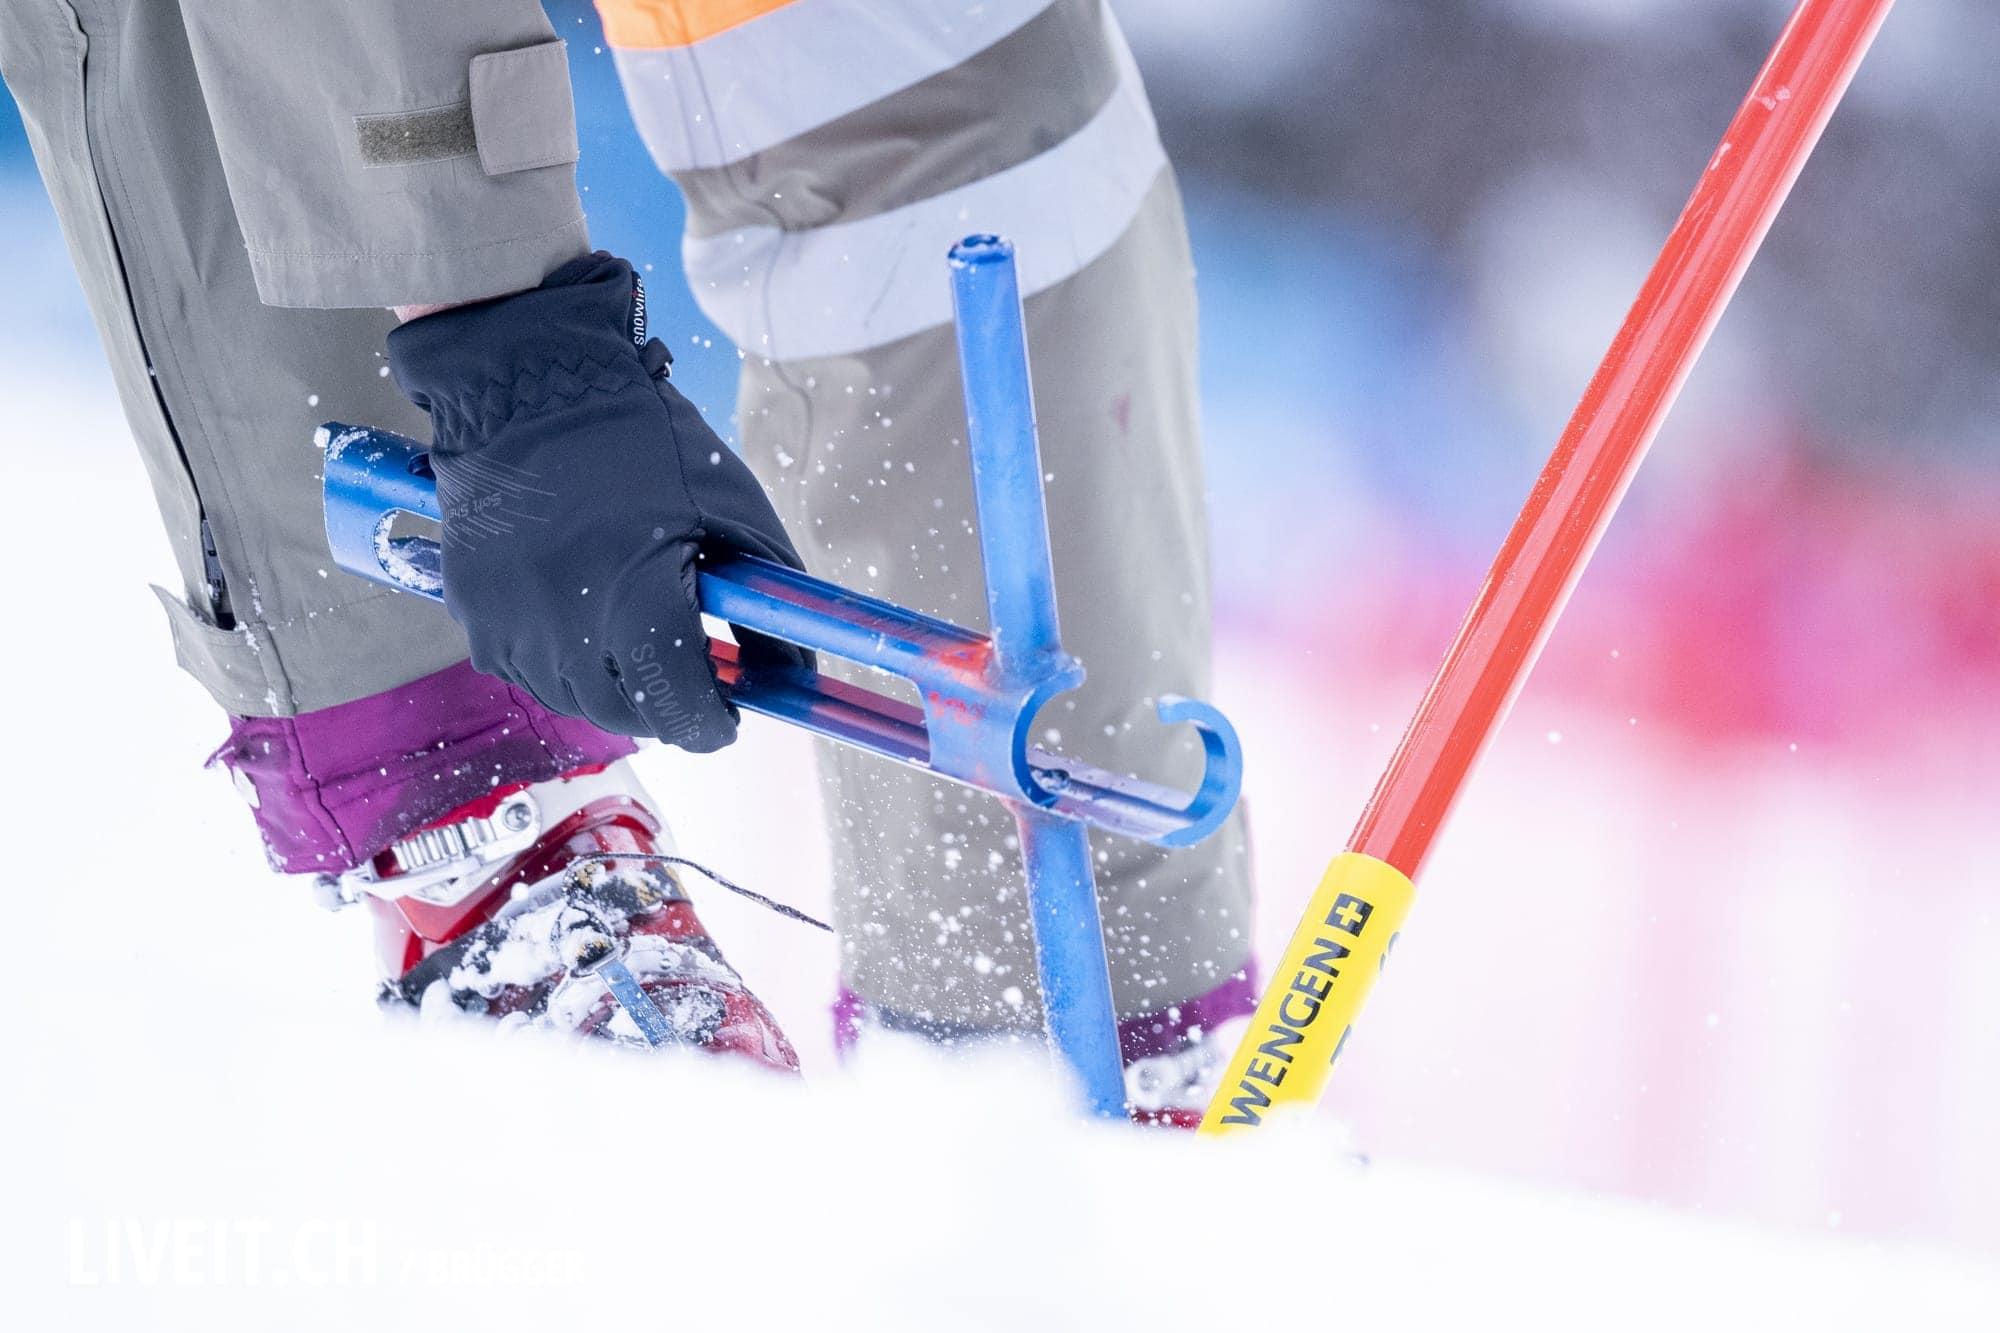 Helfer fotografiert am Freitag, 18. Januar 2019 am Lauberhornrennen in der Disziplin: Slalom Alpine Kombination. (Fotografiert von Dominic Bruegger liveit.ch)